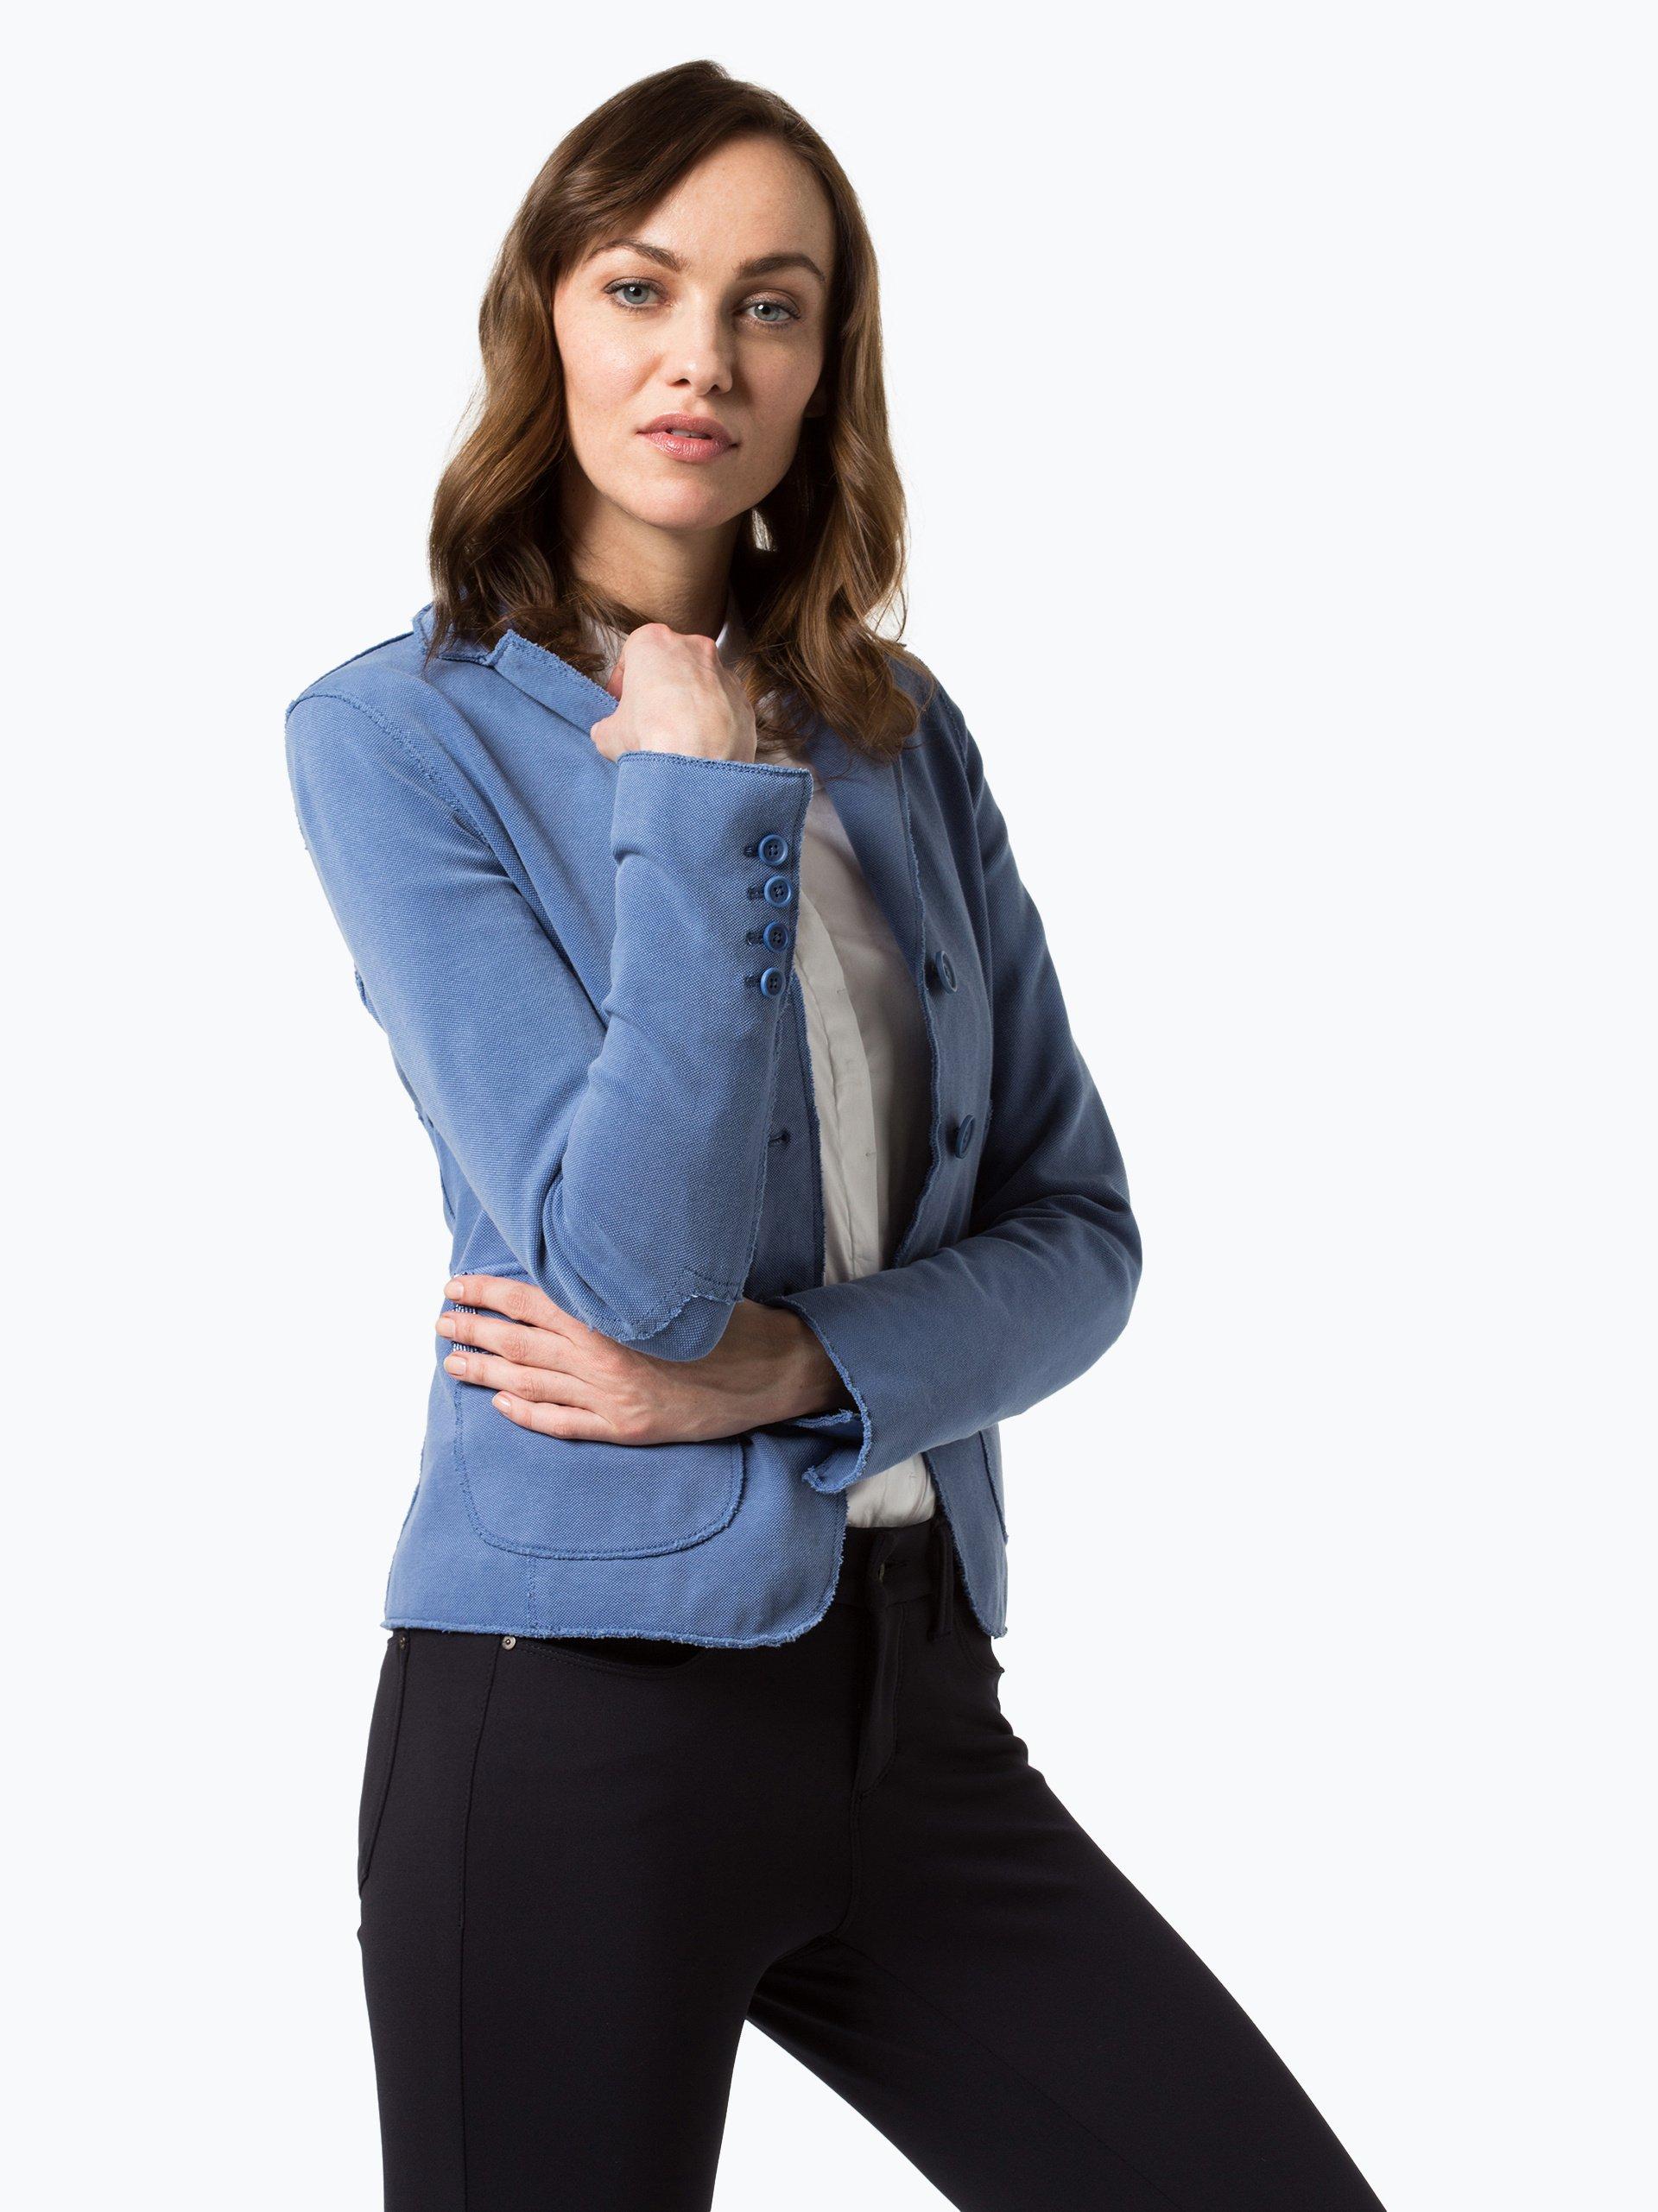 blonde no 8 damen blazer cannes blau gemustert online kaufen vangraaf com. Black Bedroom Furniture Sets. Home Design Ideas